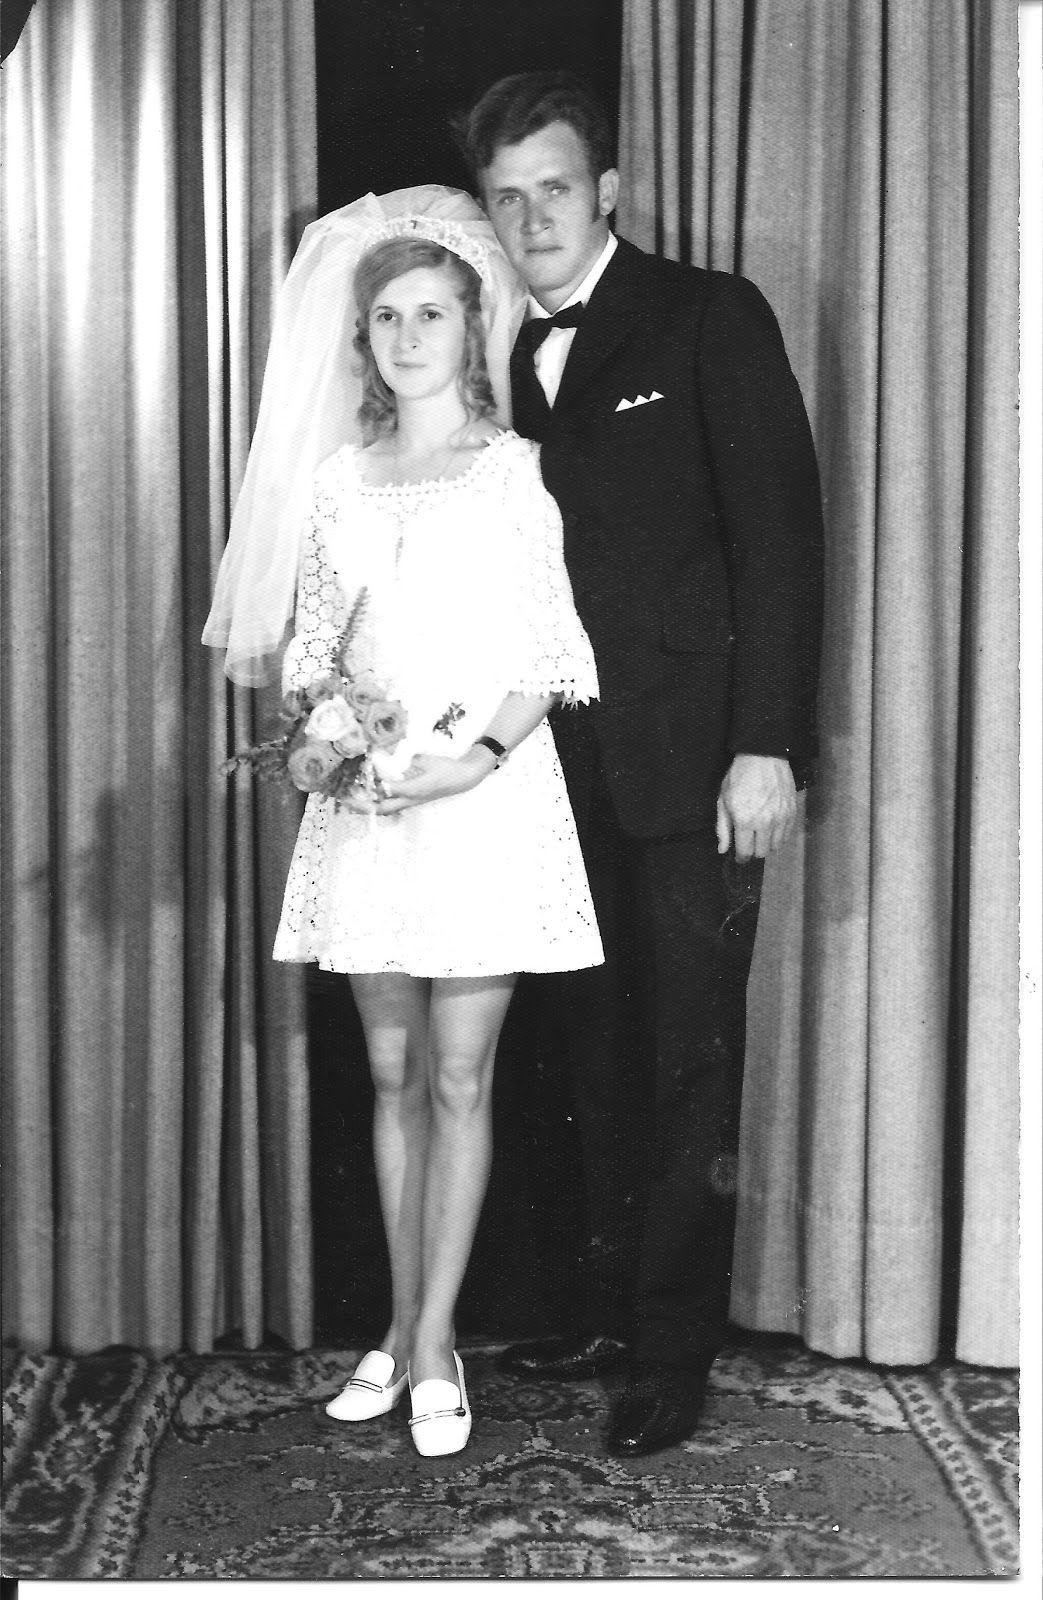 An Absence Civil Wedding Dresses Wedding Dresses Vintage Wedding Gowns Vintage [ 1600 x 1043 Pixel ]